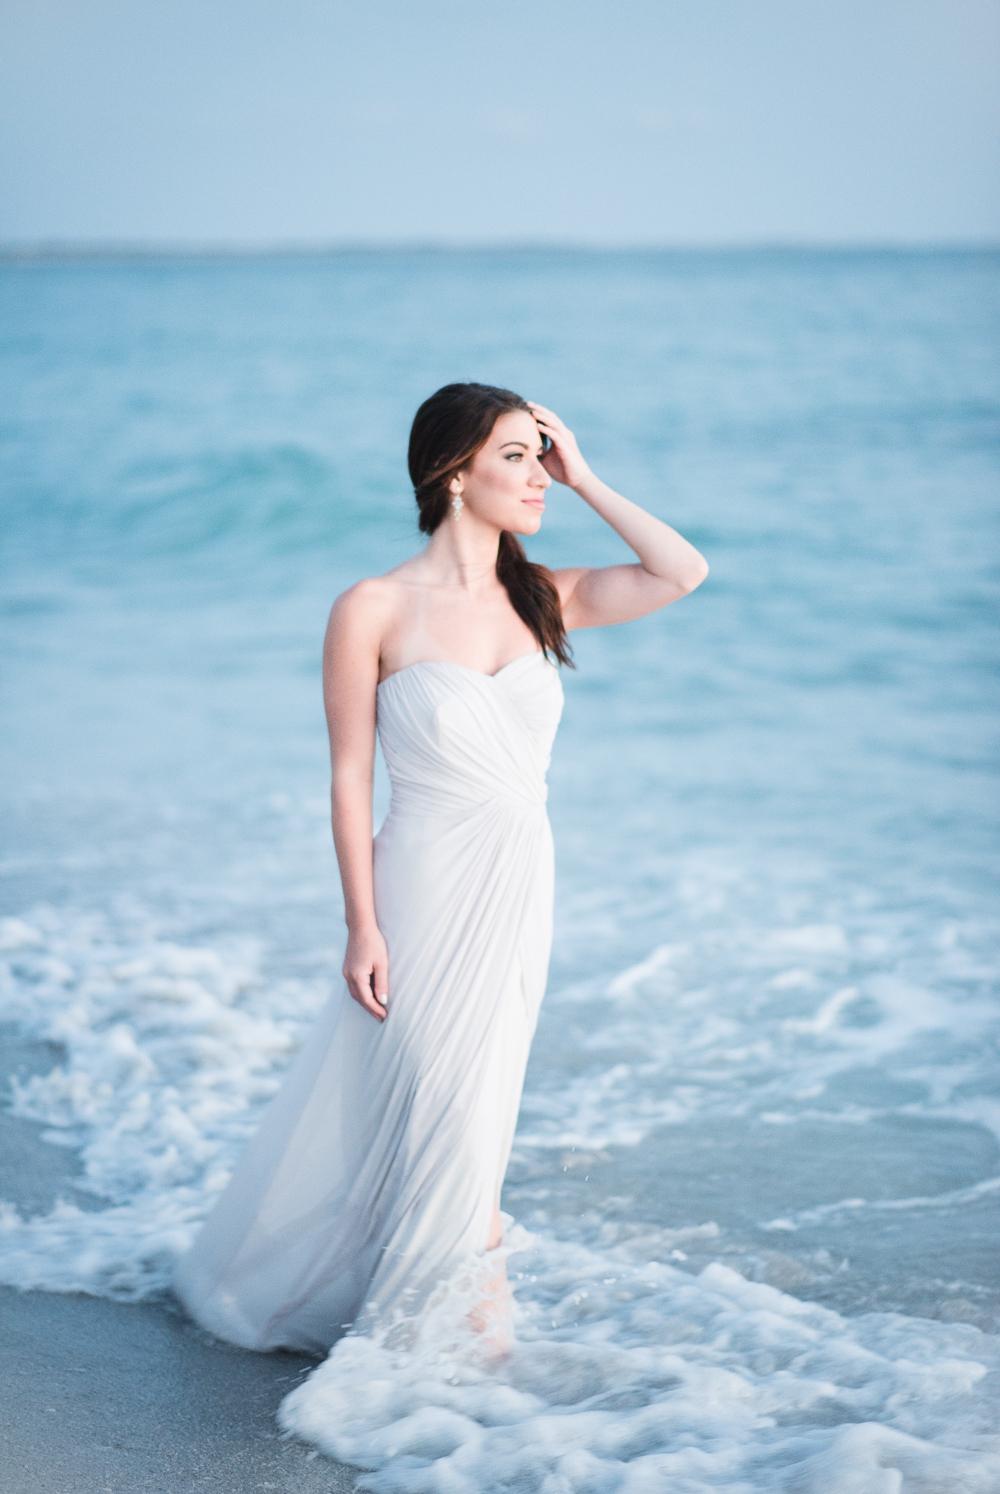 2016 HLM Wedding Beach Shoot 24.jpg